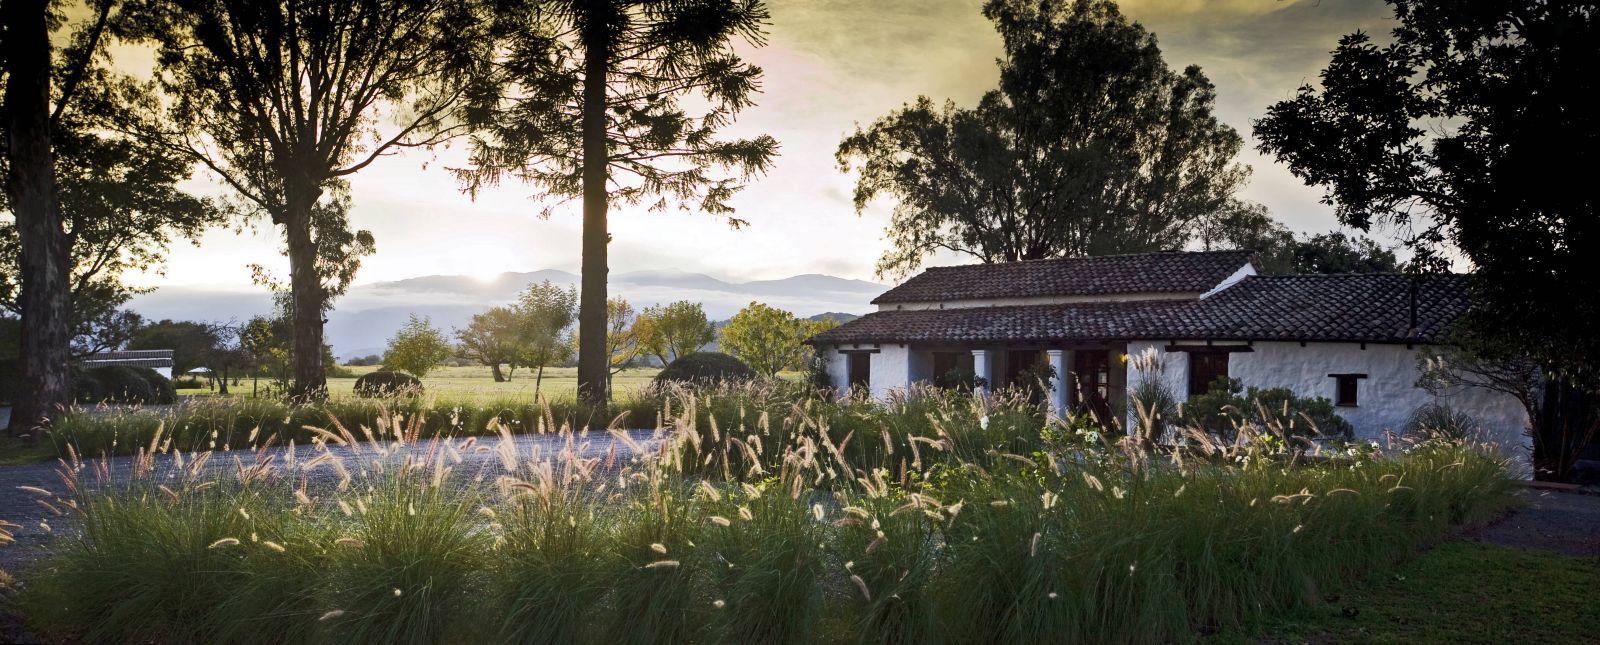 House of Jasmines – Relais & Châteaux